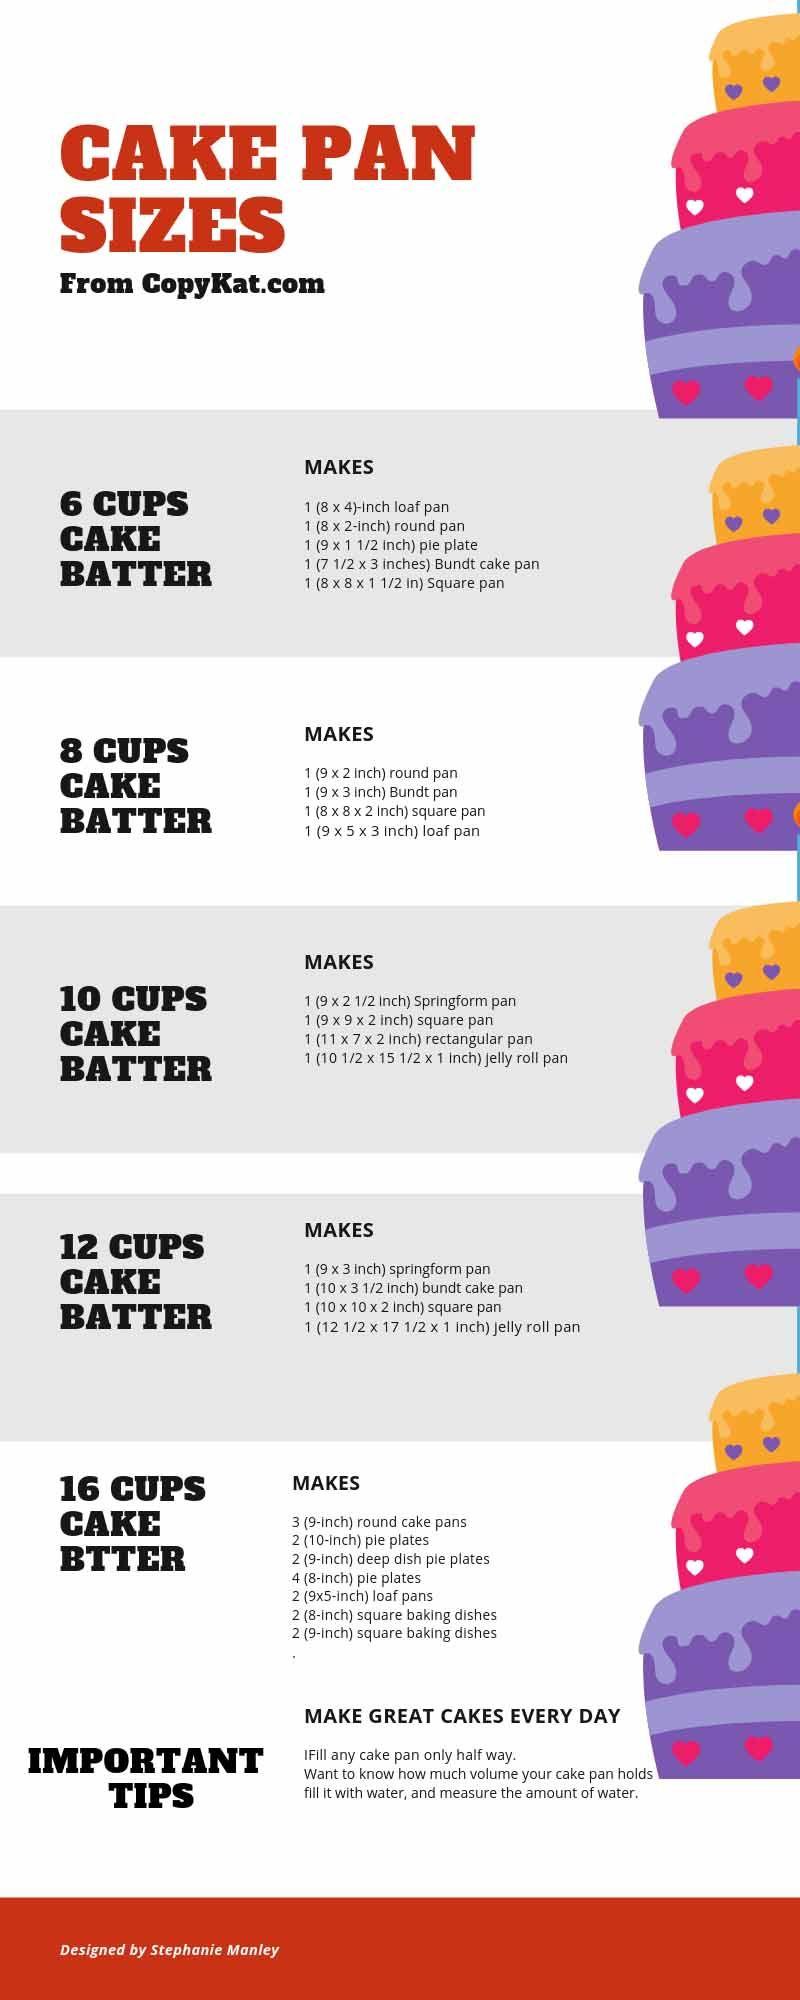 13++ 8 inch cake pan recipe inspirations